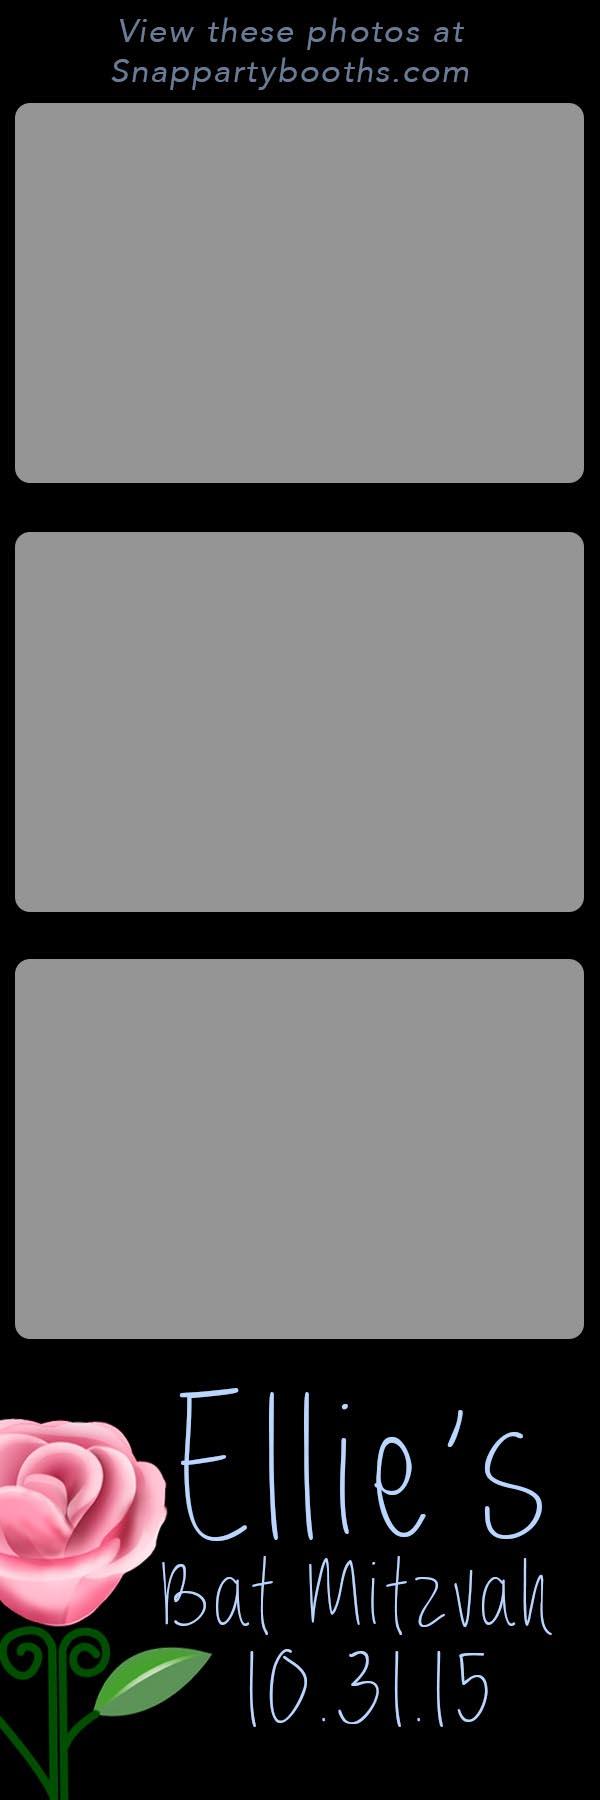 Layout-01.jpg